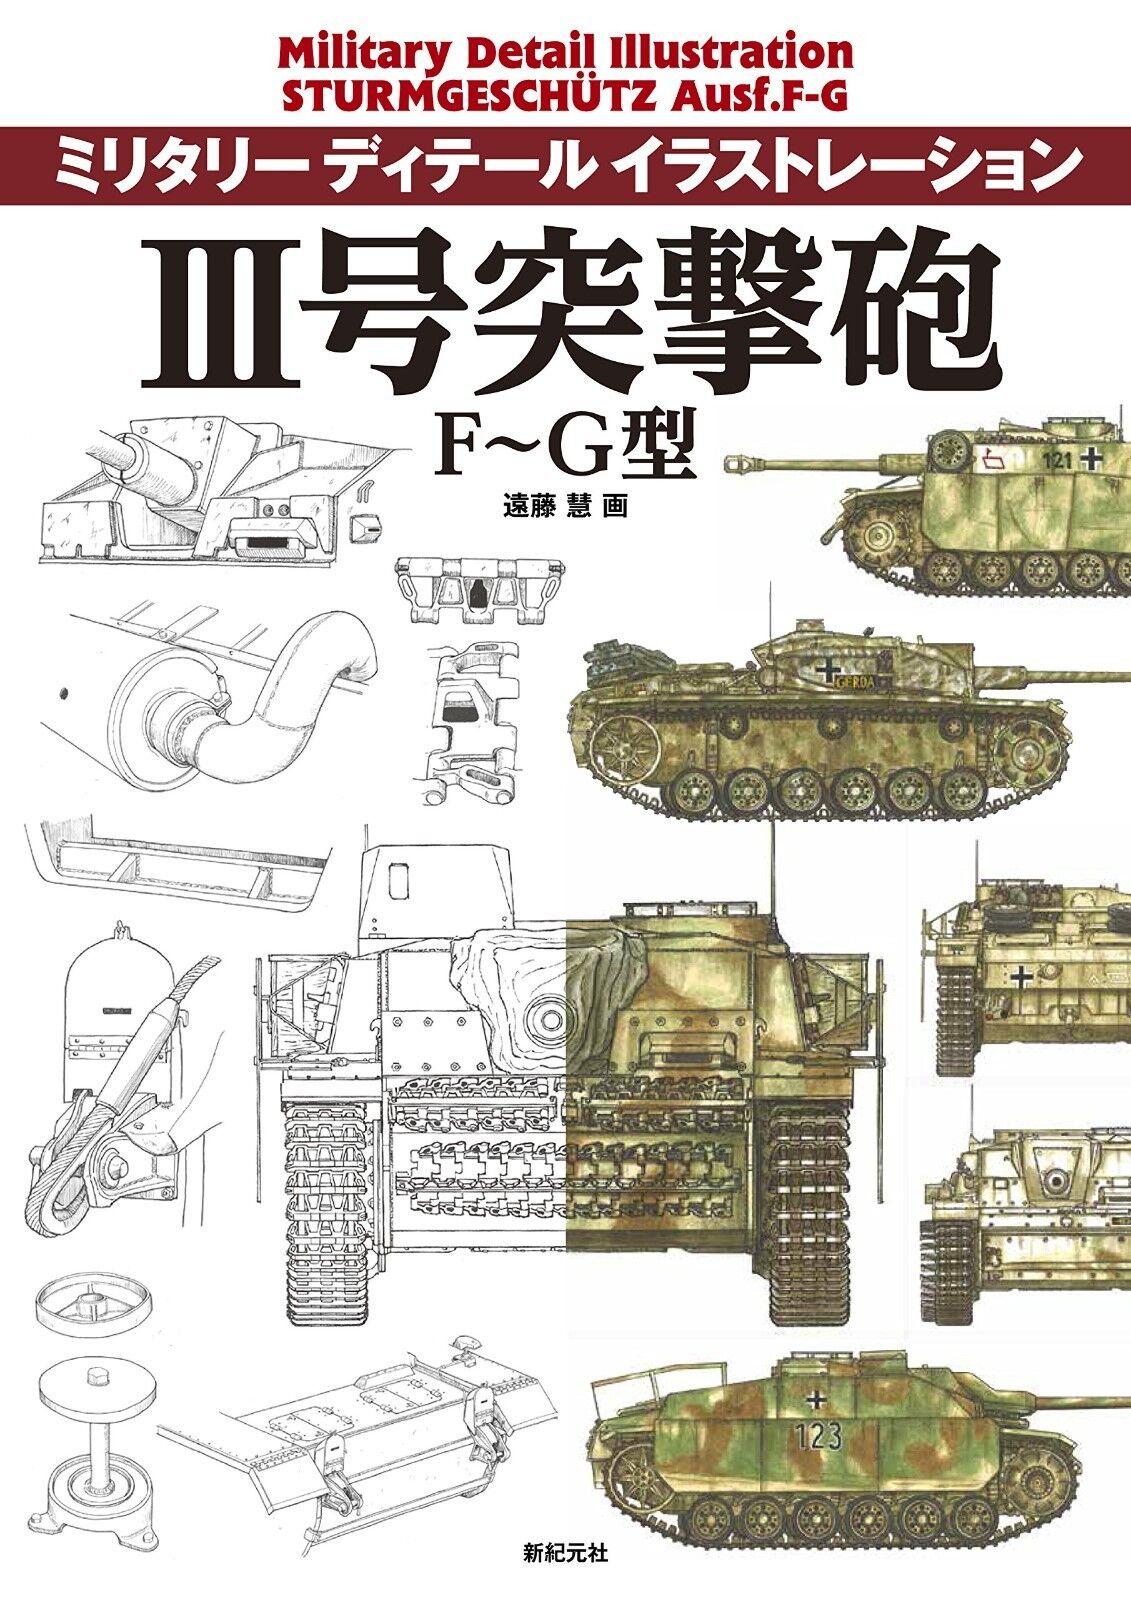 Sturmgeschutz III Ausf.F-G Military Detail Illustration Japan